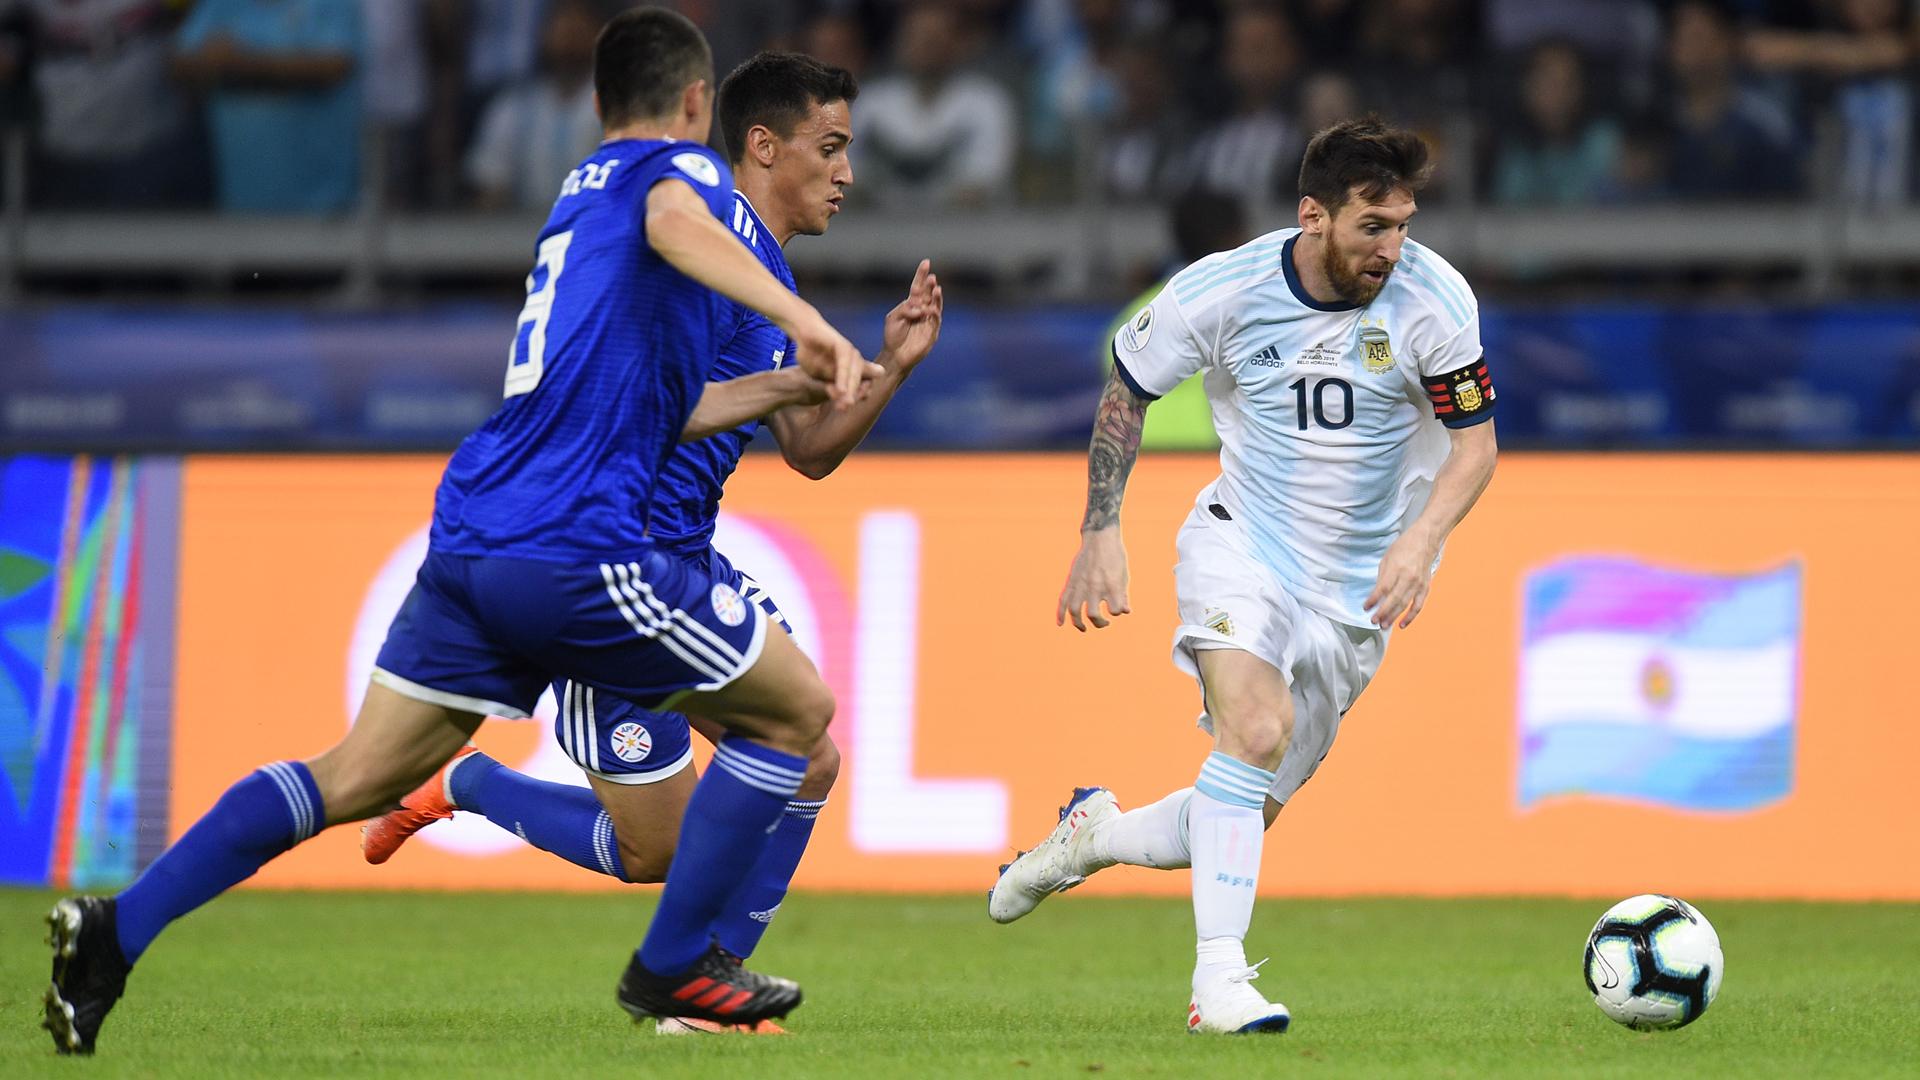 Argentina 1 Paraguay 1: Messi scores but Copa America exit looms